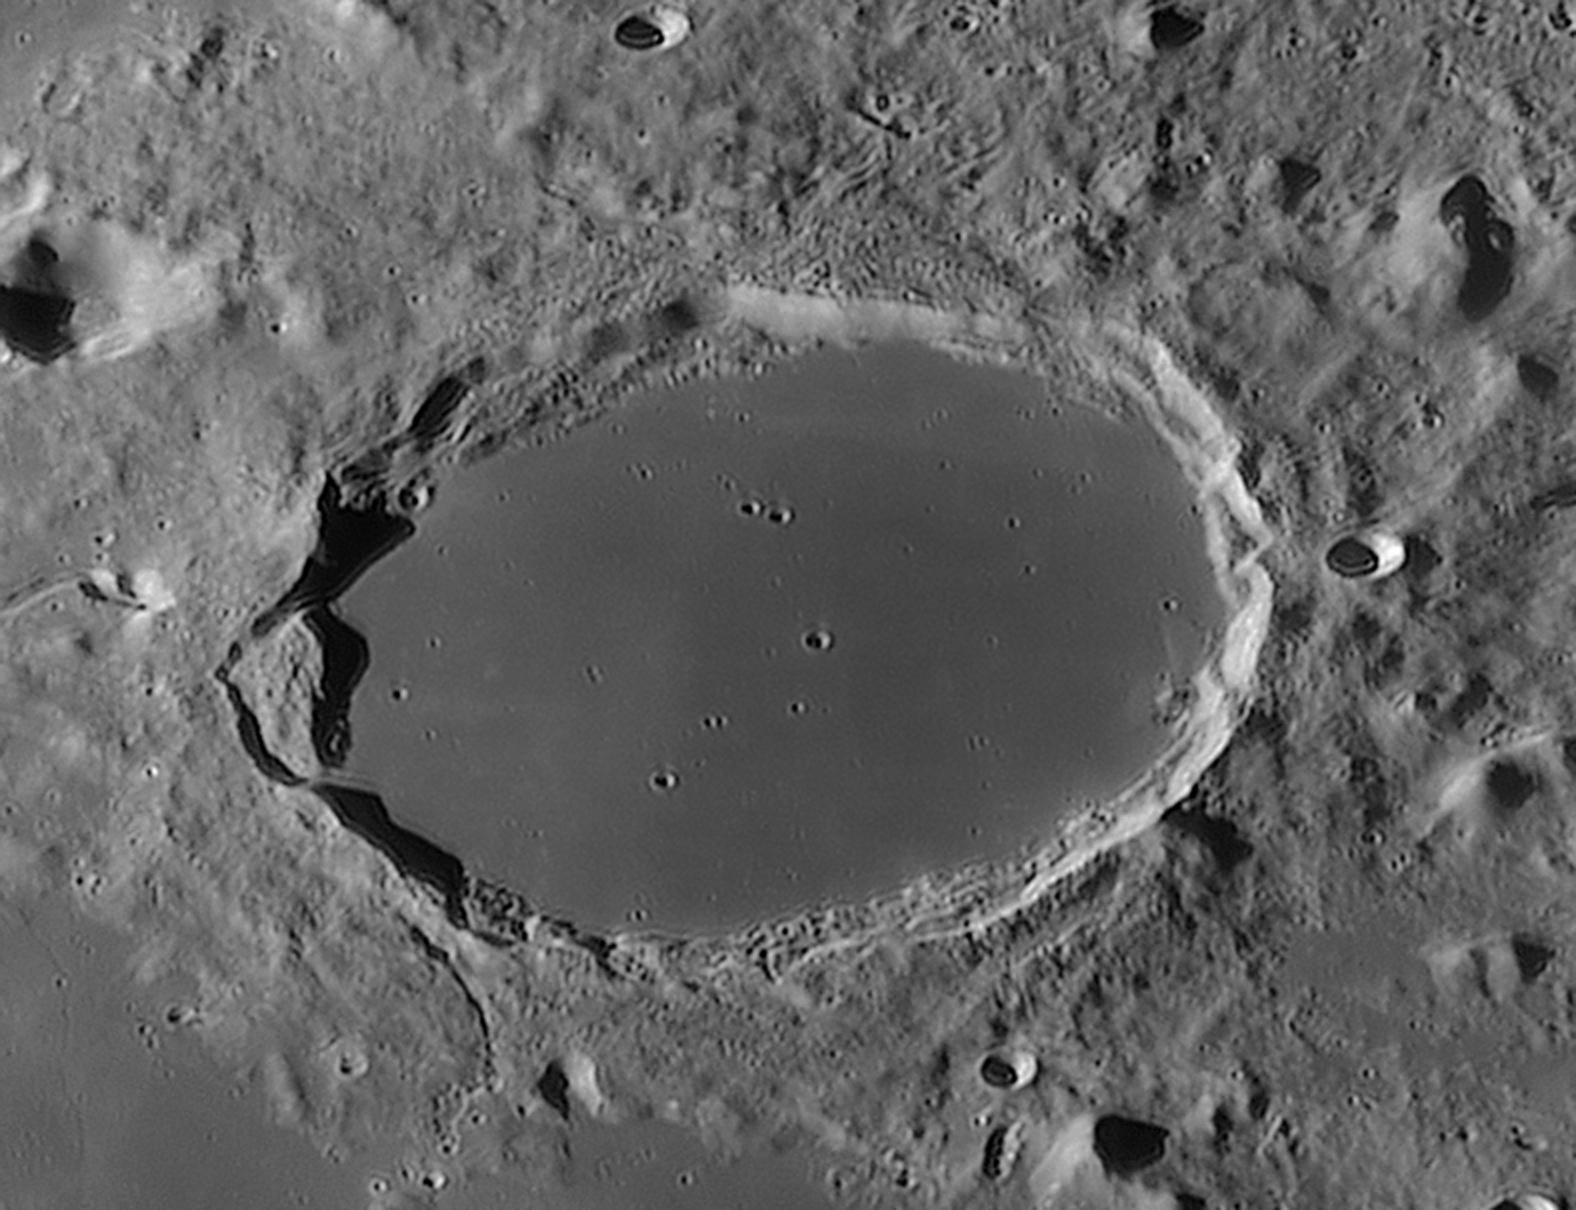 lune__2015-08-06_t_05-24com.jpg.e6fe9afe668eb5ba884c42c293097d0a.jpg